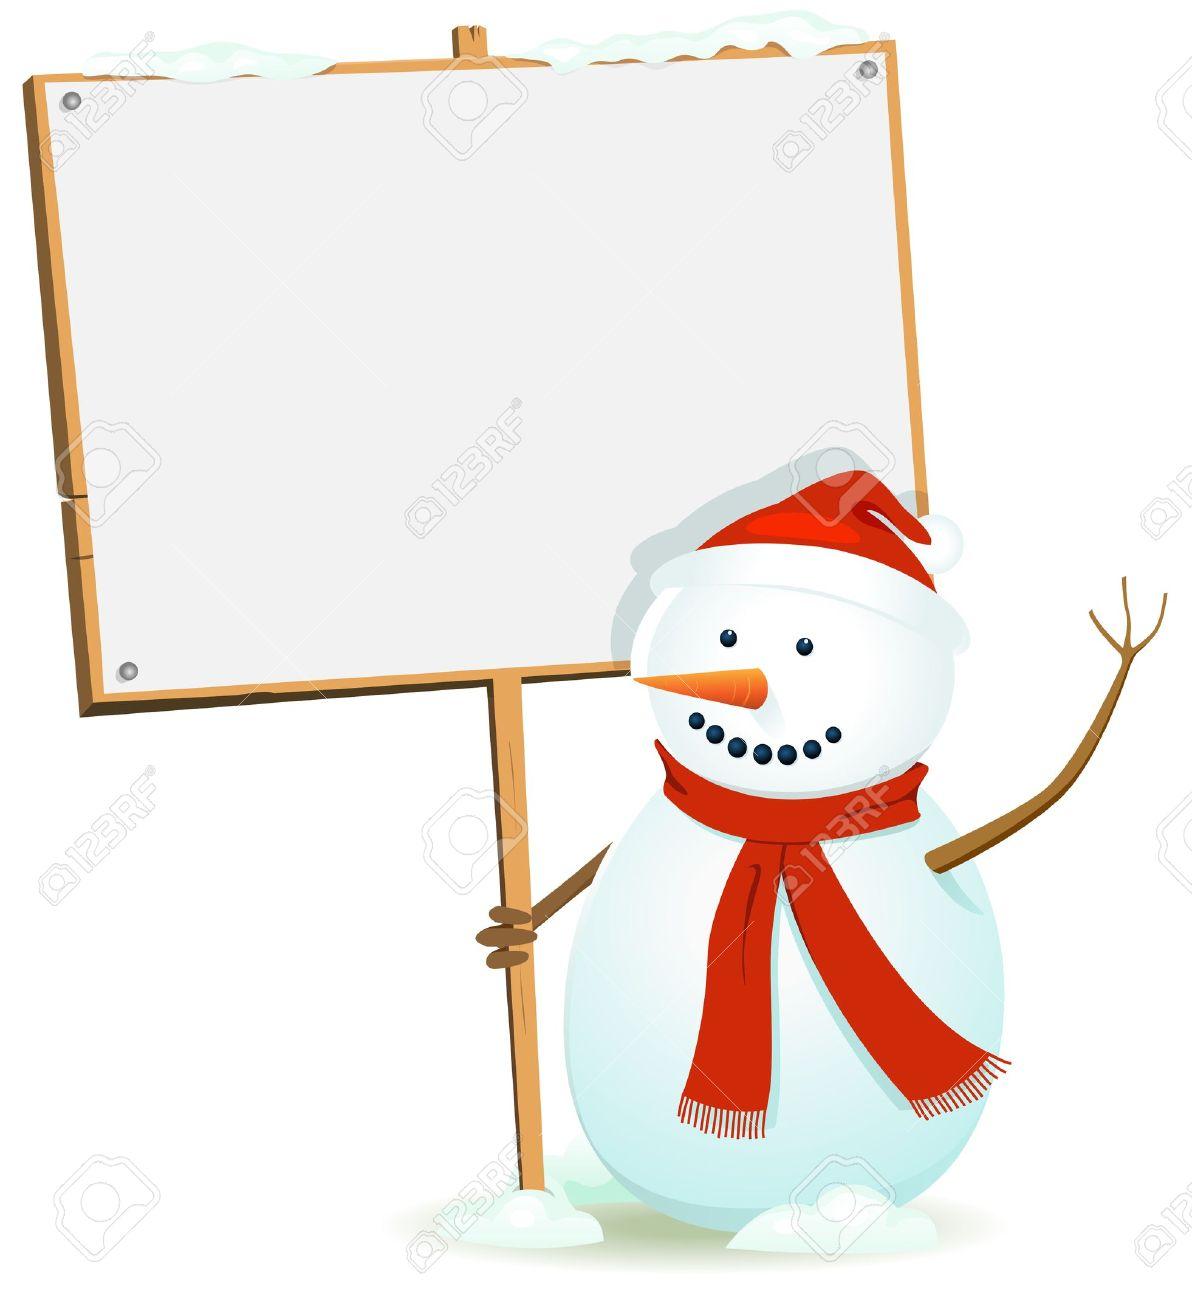 illustration of a cartoon happy santa claus snowman character holding blank wood sign for christmas or - Snowman Santa